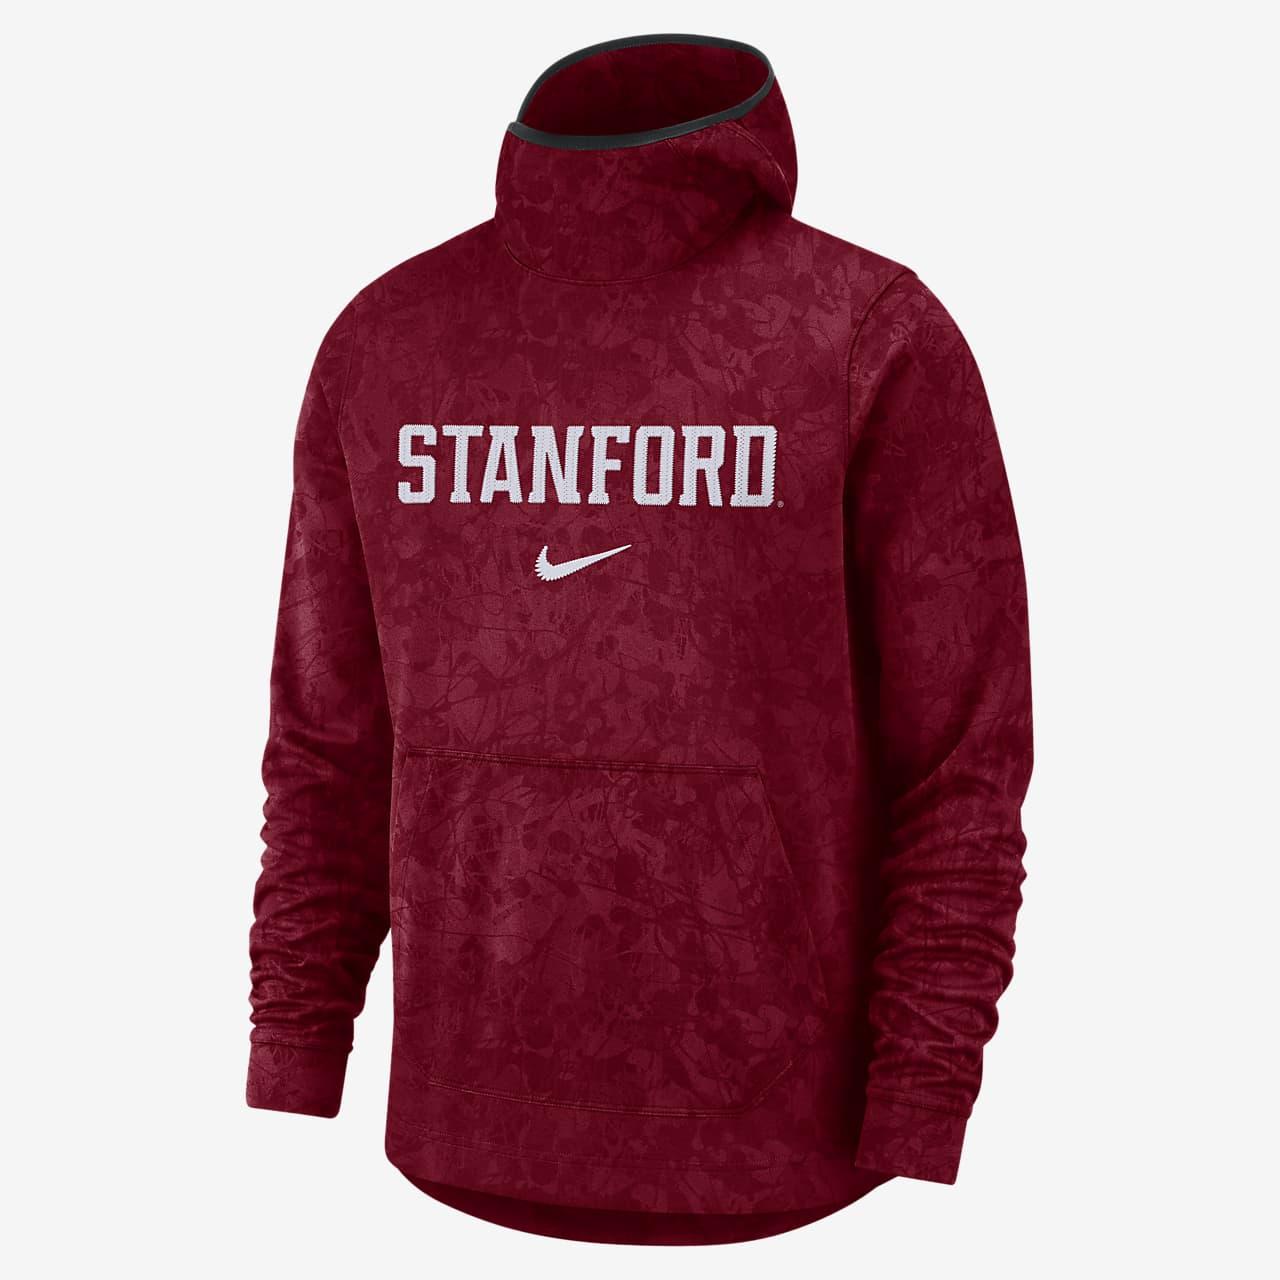 Nike College Dri-FIT Spotlight (Stanford) Men's Pullover Basketball Hoodie